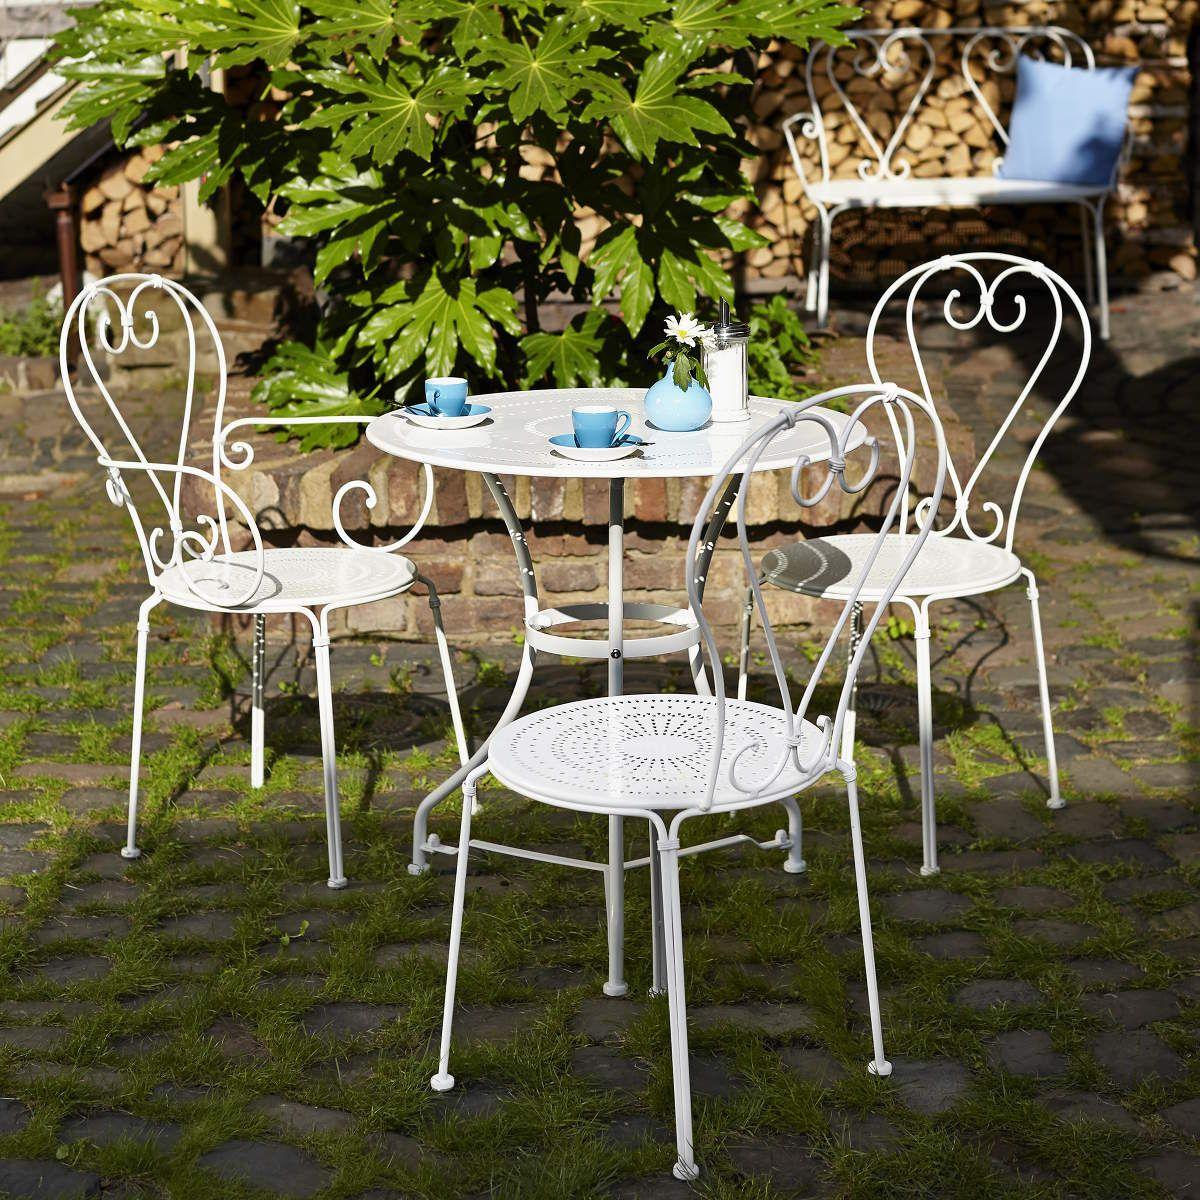 Century Gartenmobel Gartenmobel Aussenmobel Tisch Und